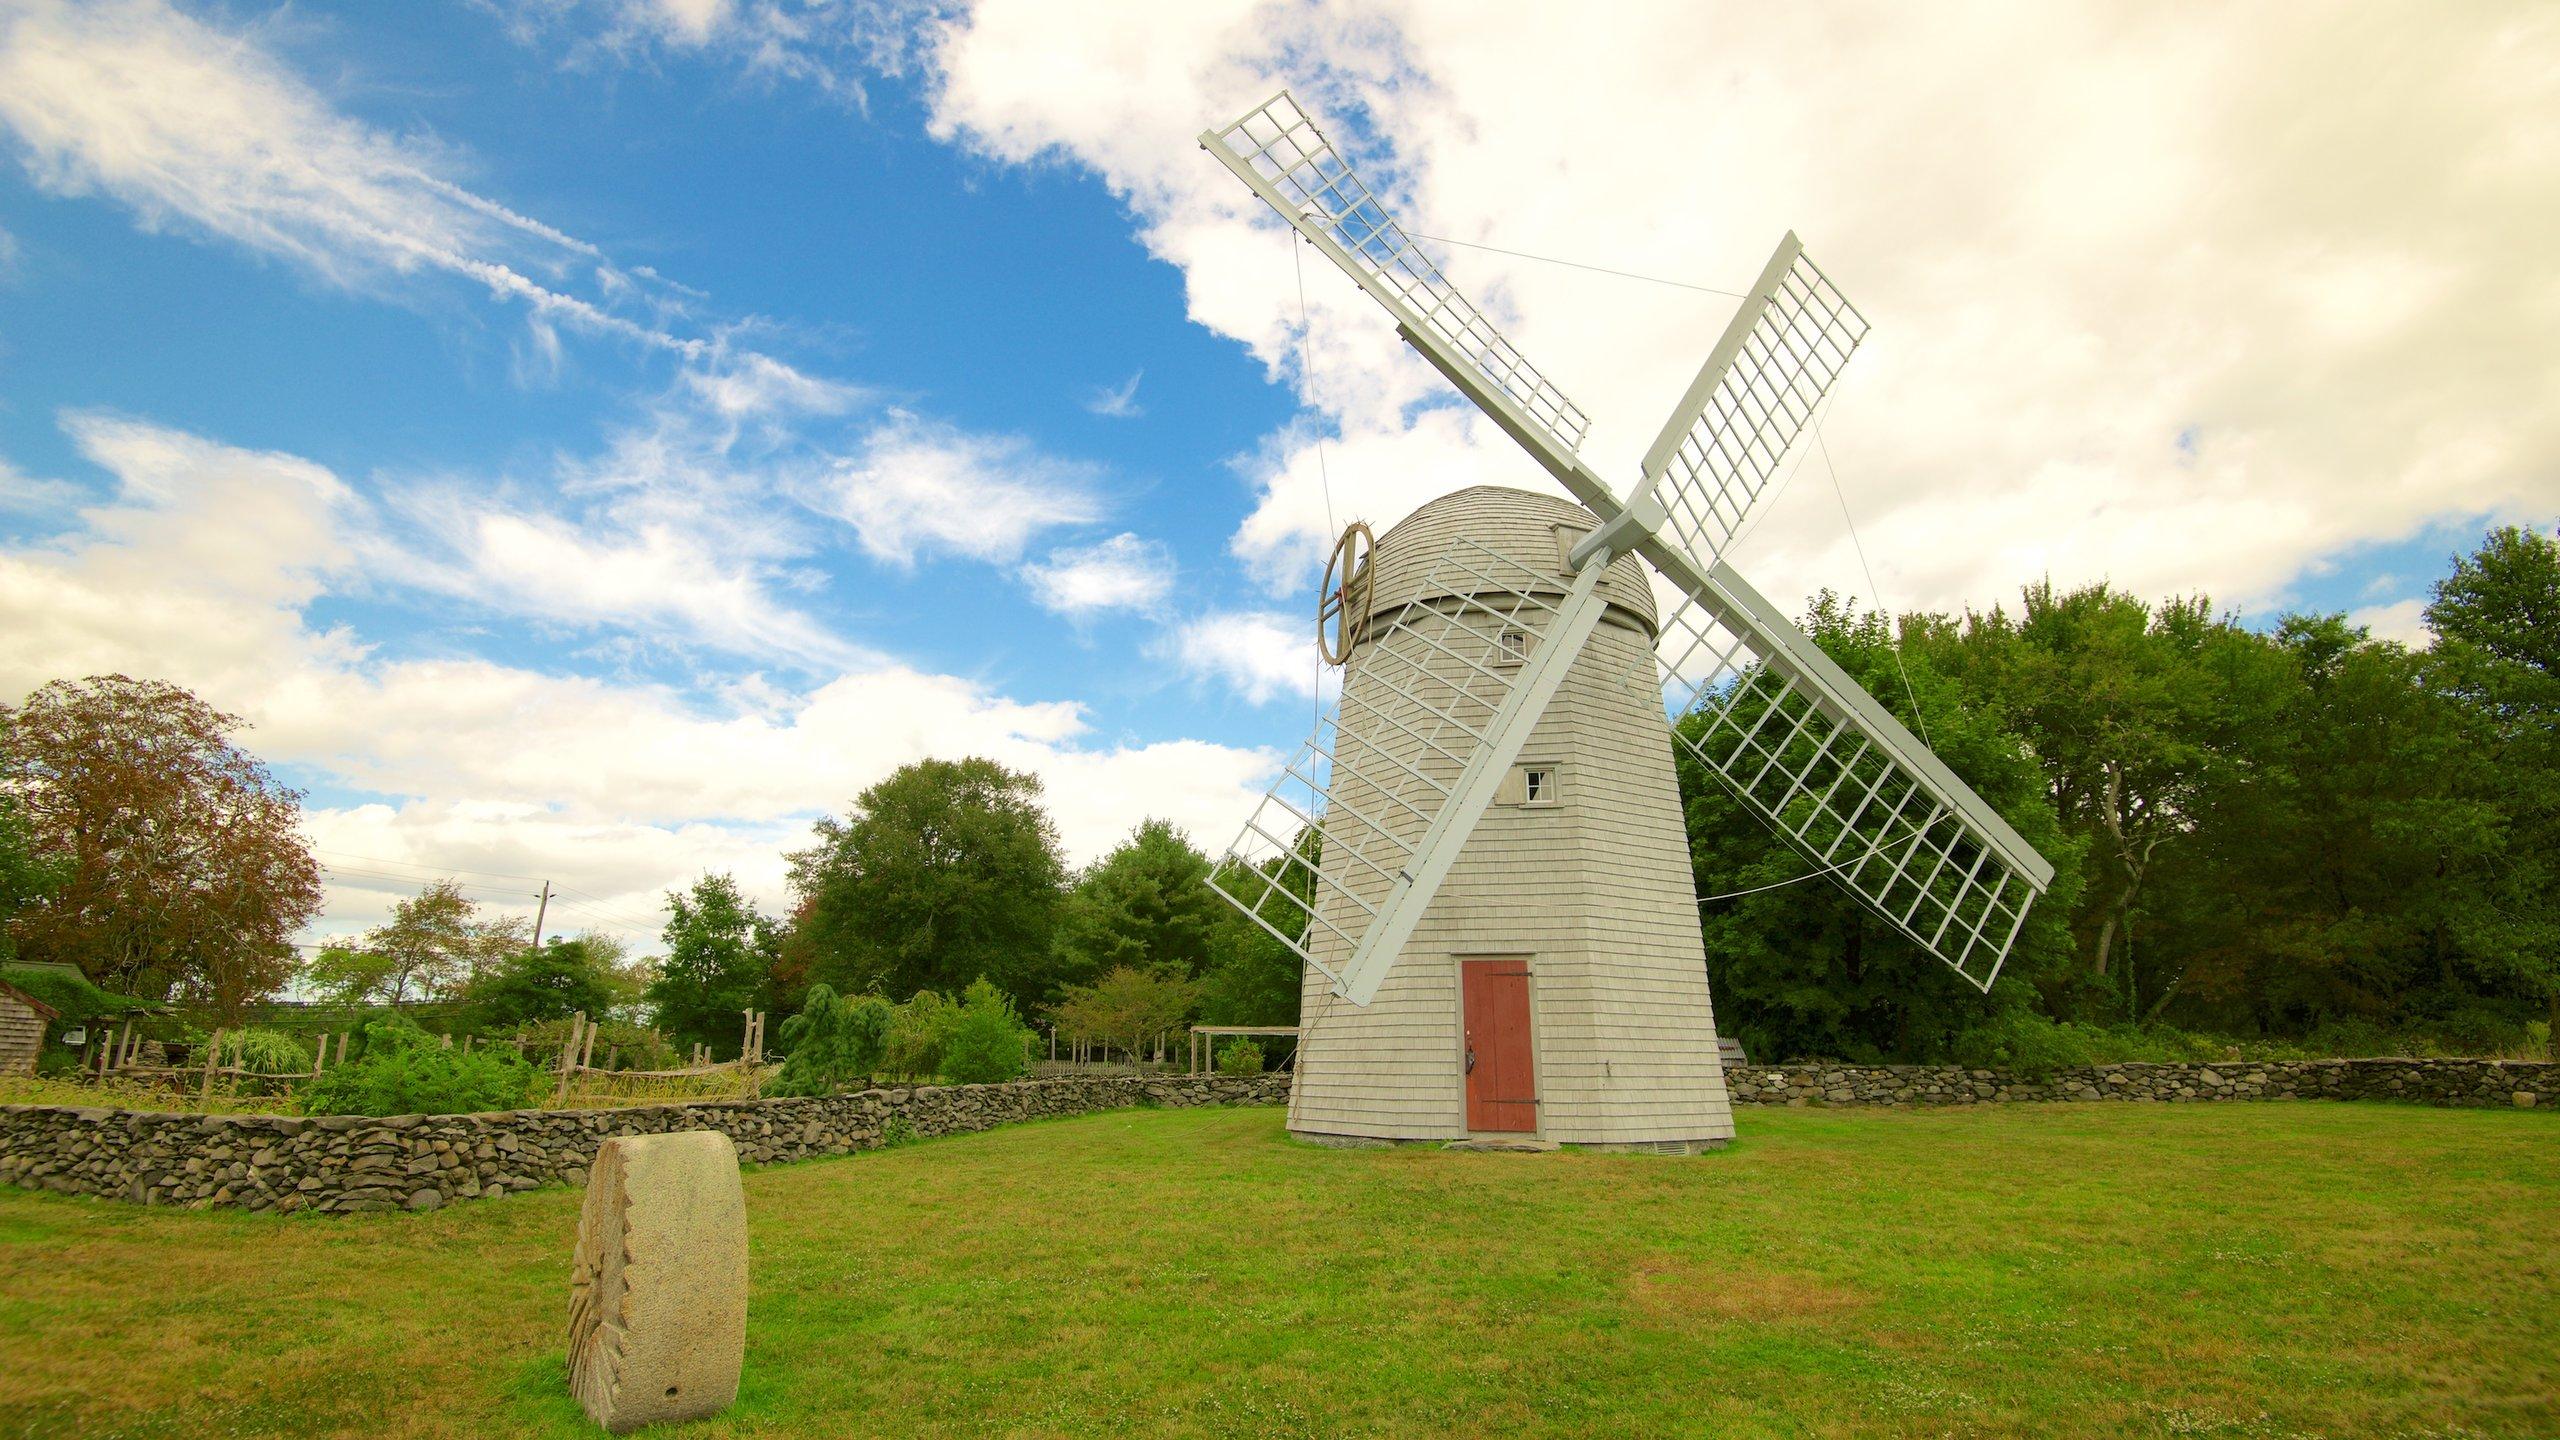 Jamestown Windmill, Jamestown, Rhode Island, United States of America